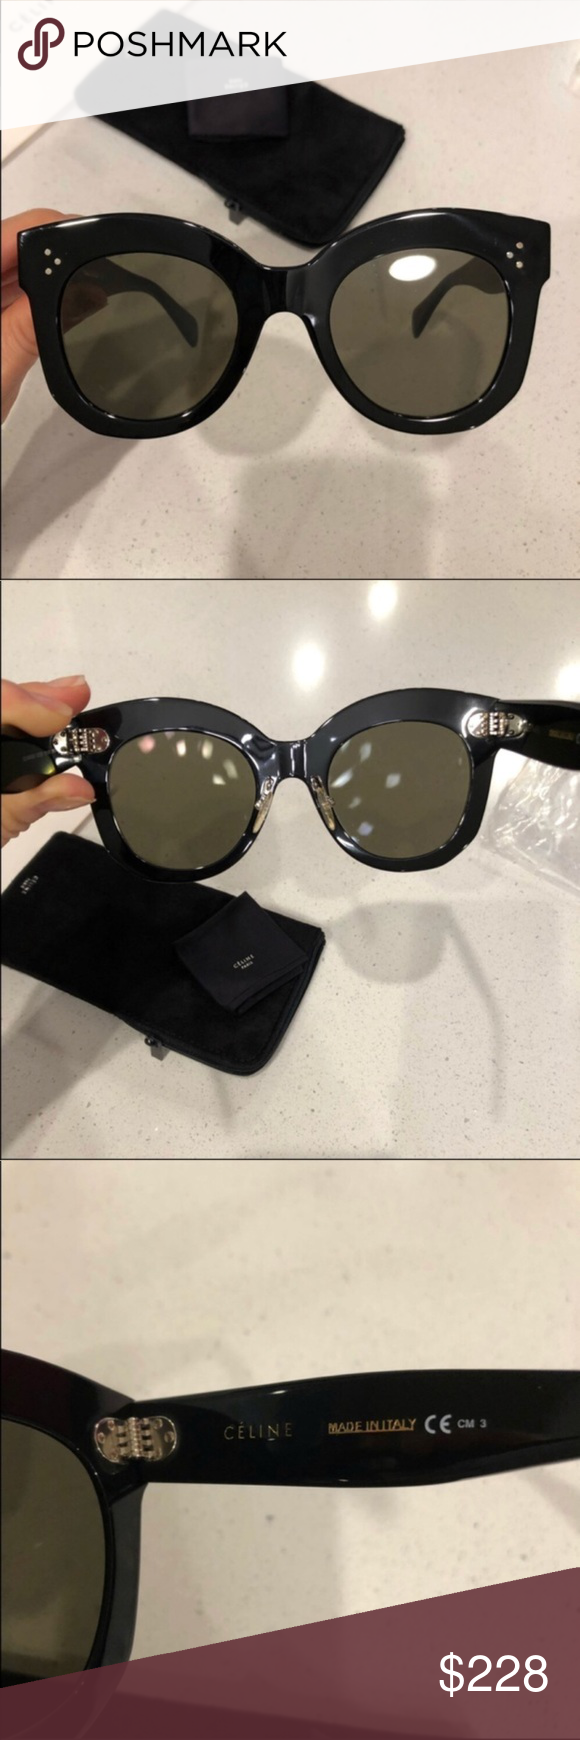 45841784f4bcd Celine sunglasses 😎 Celine 41443 s Chris black grey sunglasses New  condition. 100% authentic guaranteed. Sunglasses come with original Celine  case and ...